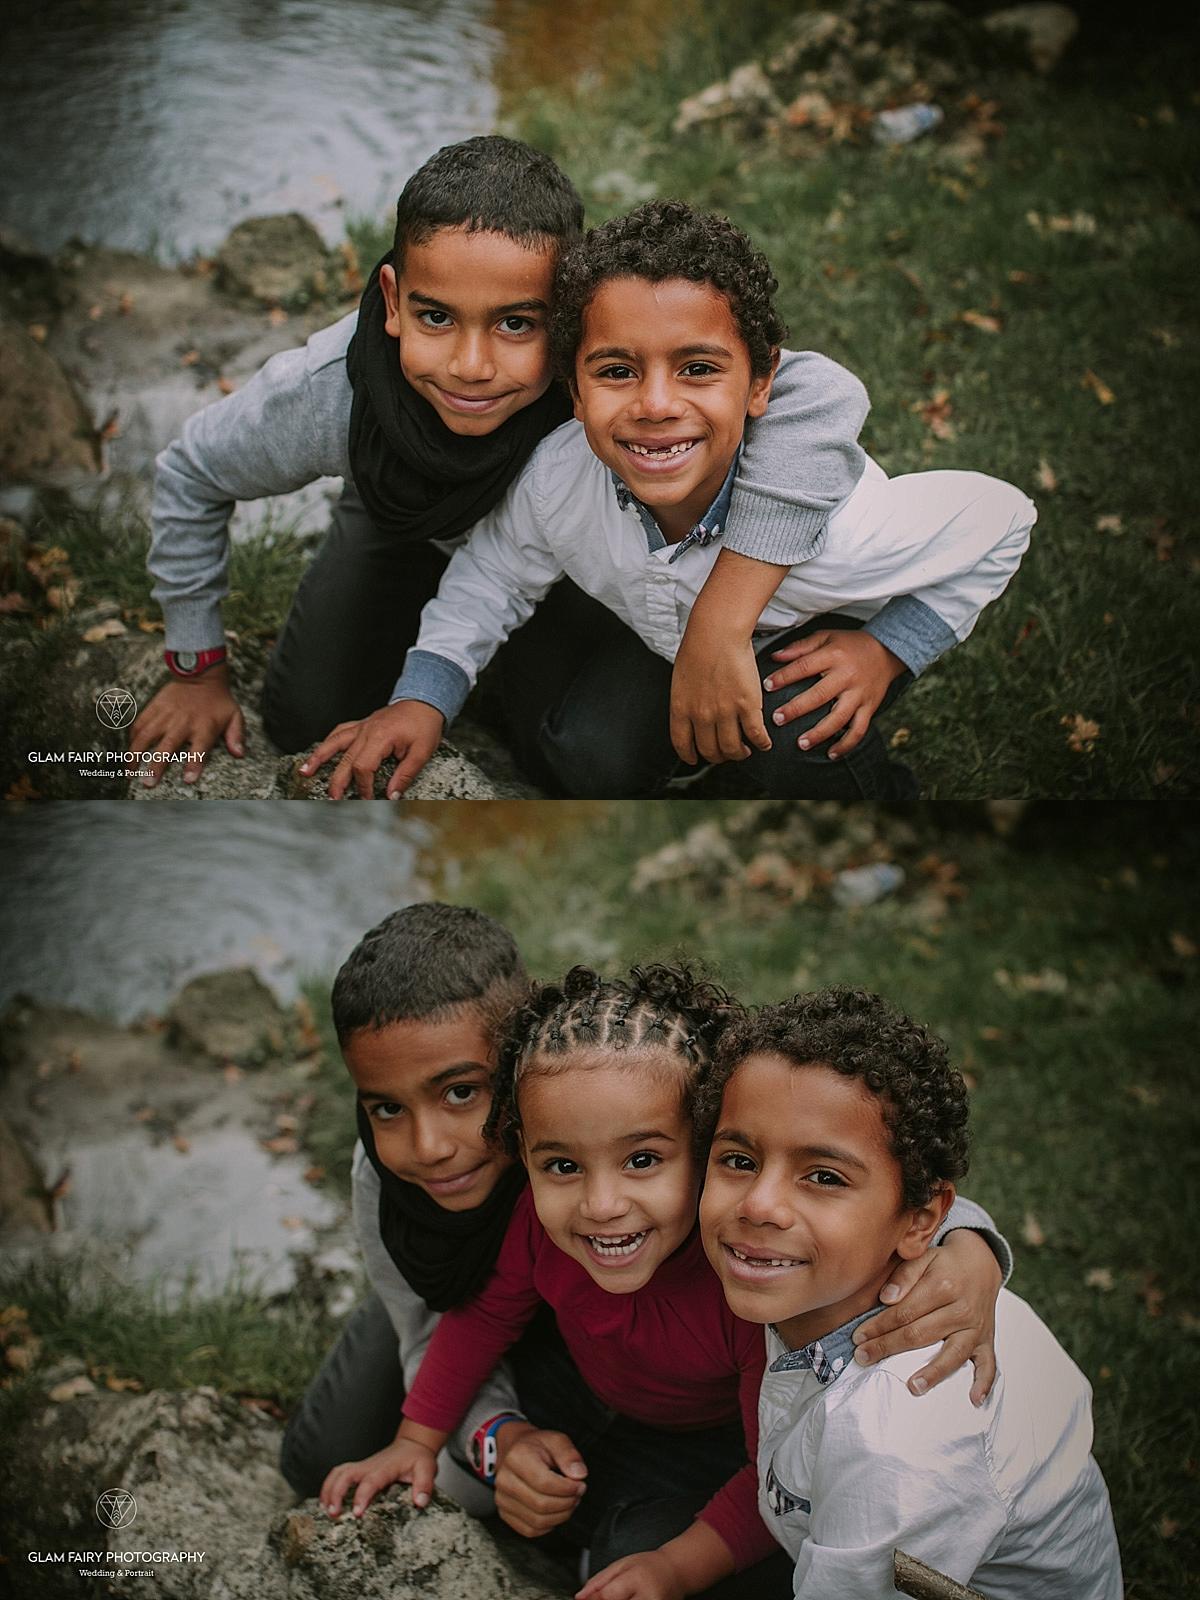 GlamFairyPhotography-mini-session-famille-a-vincennes-caroline_0002